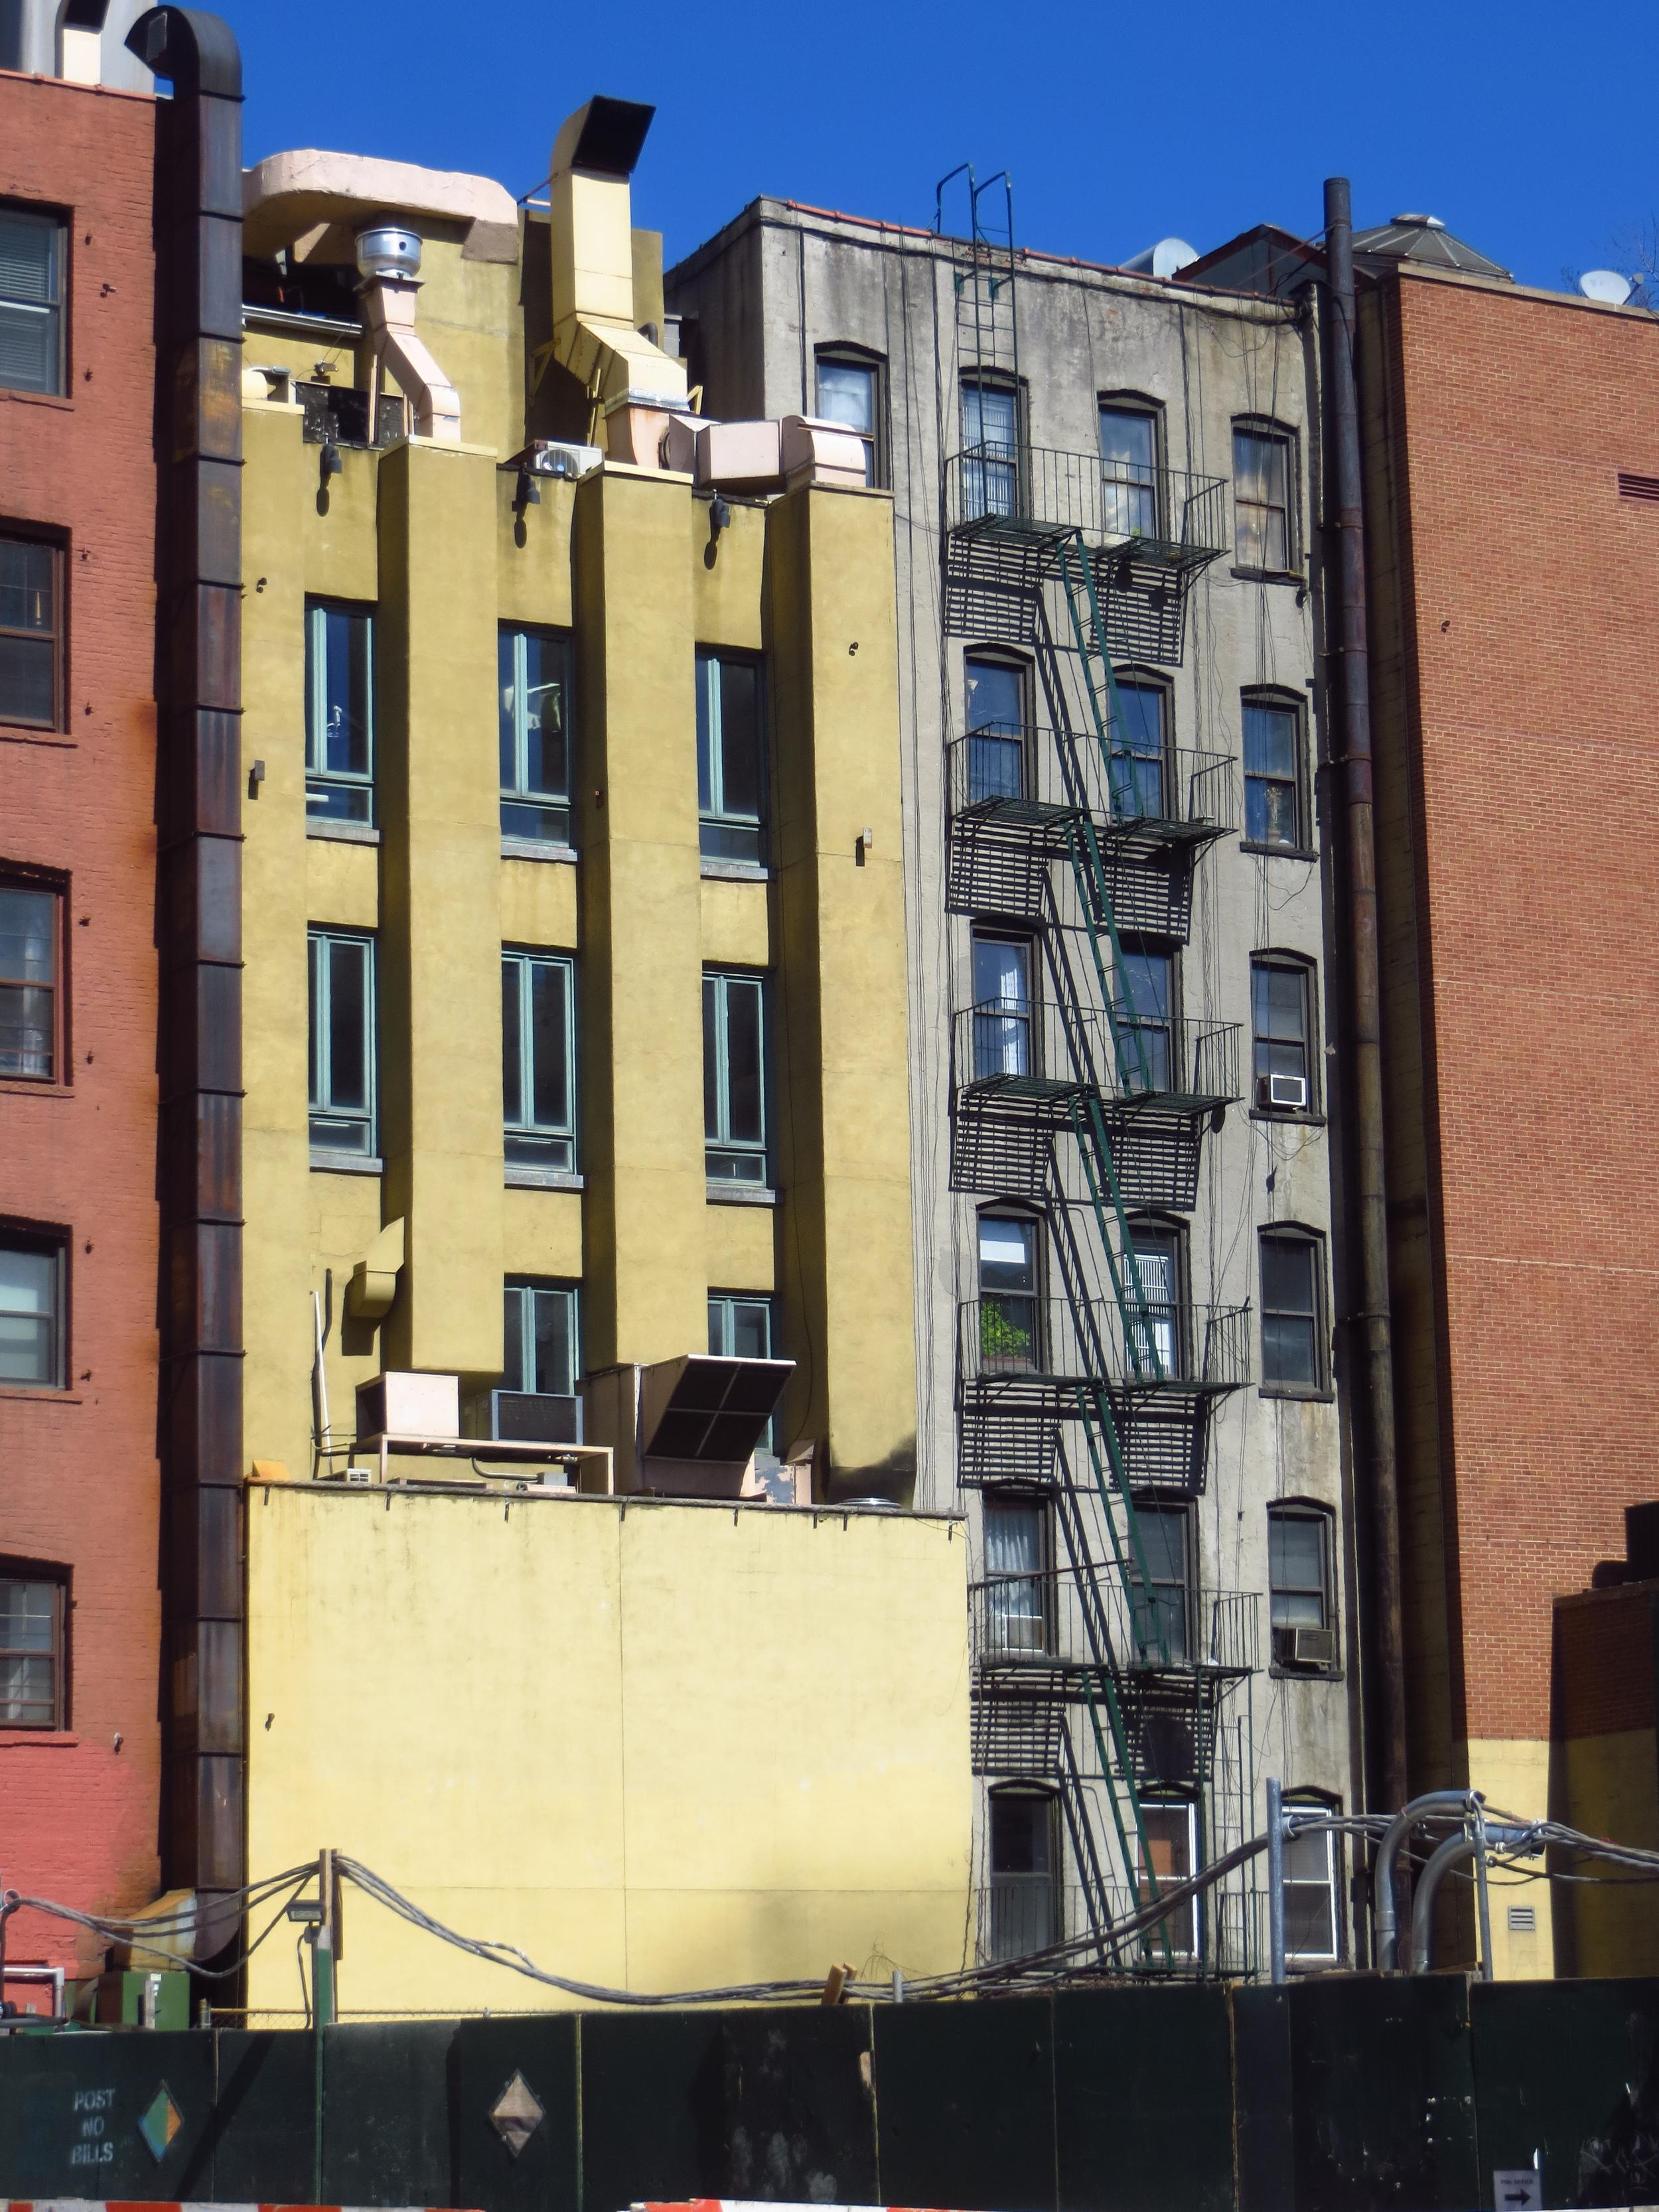 Back of buildings